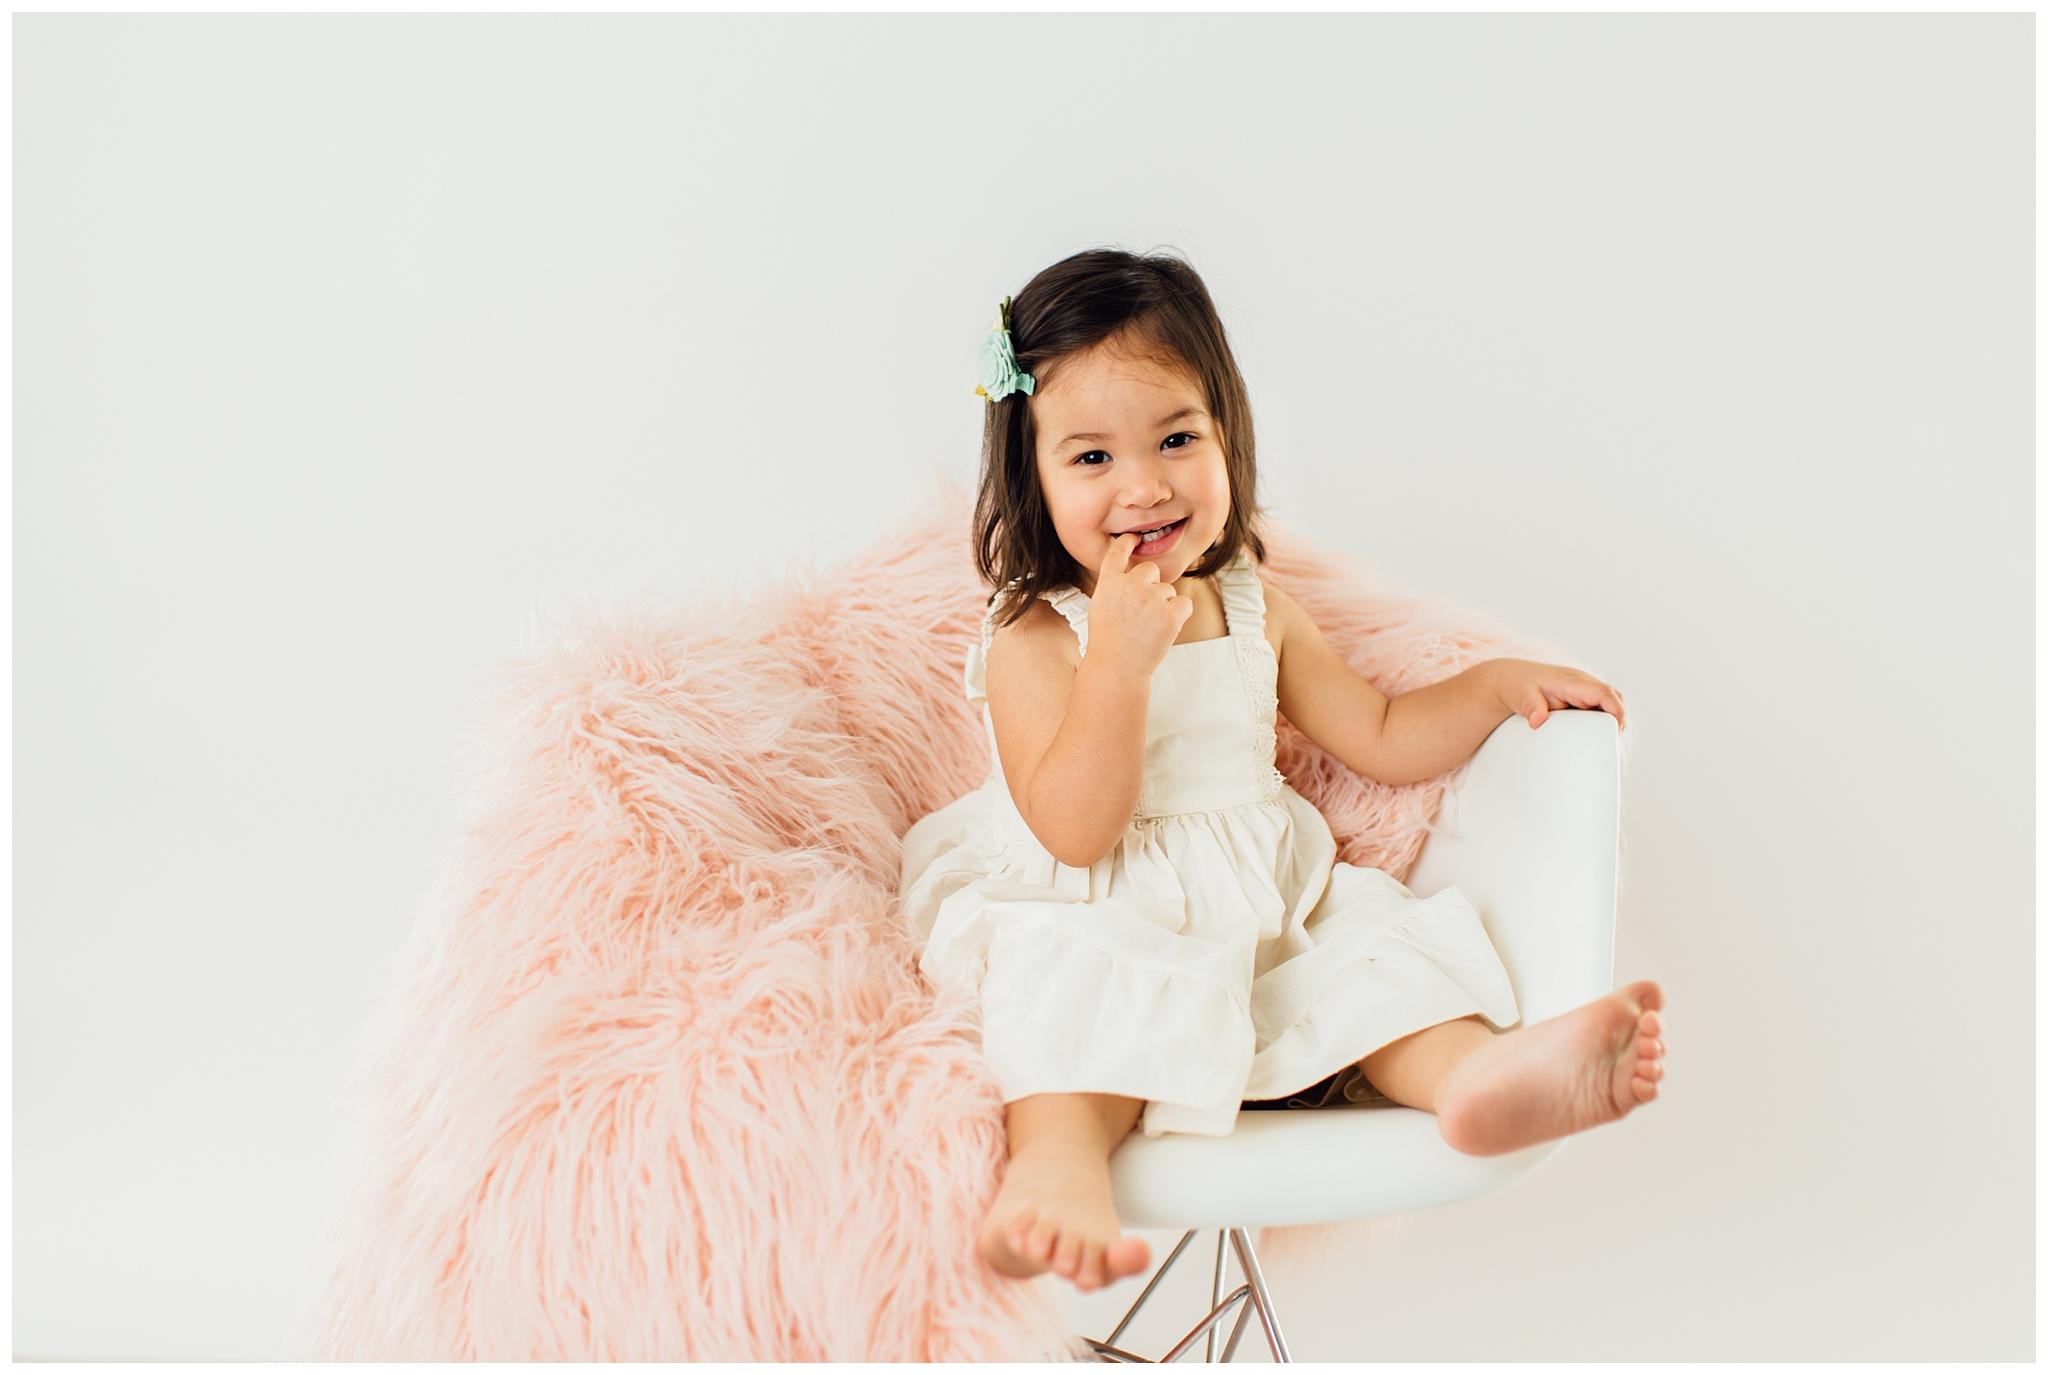 Studio Milestone Portrait Session | Phoenix Child + Baby Photographer_0011.jpg